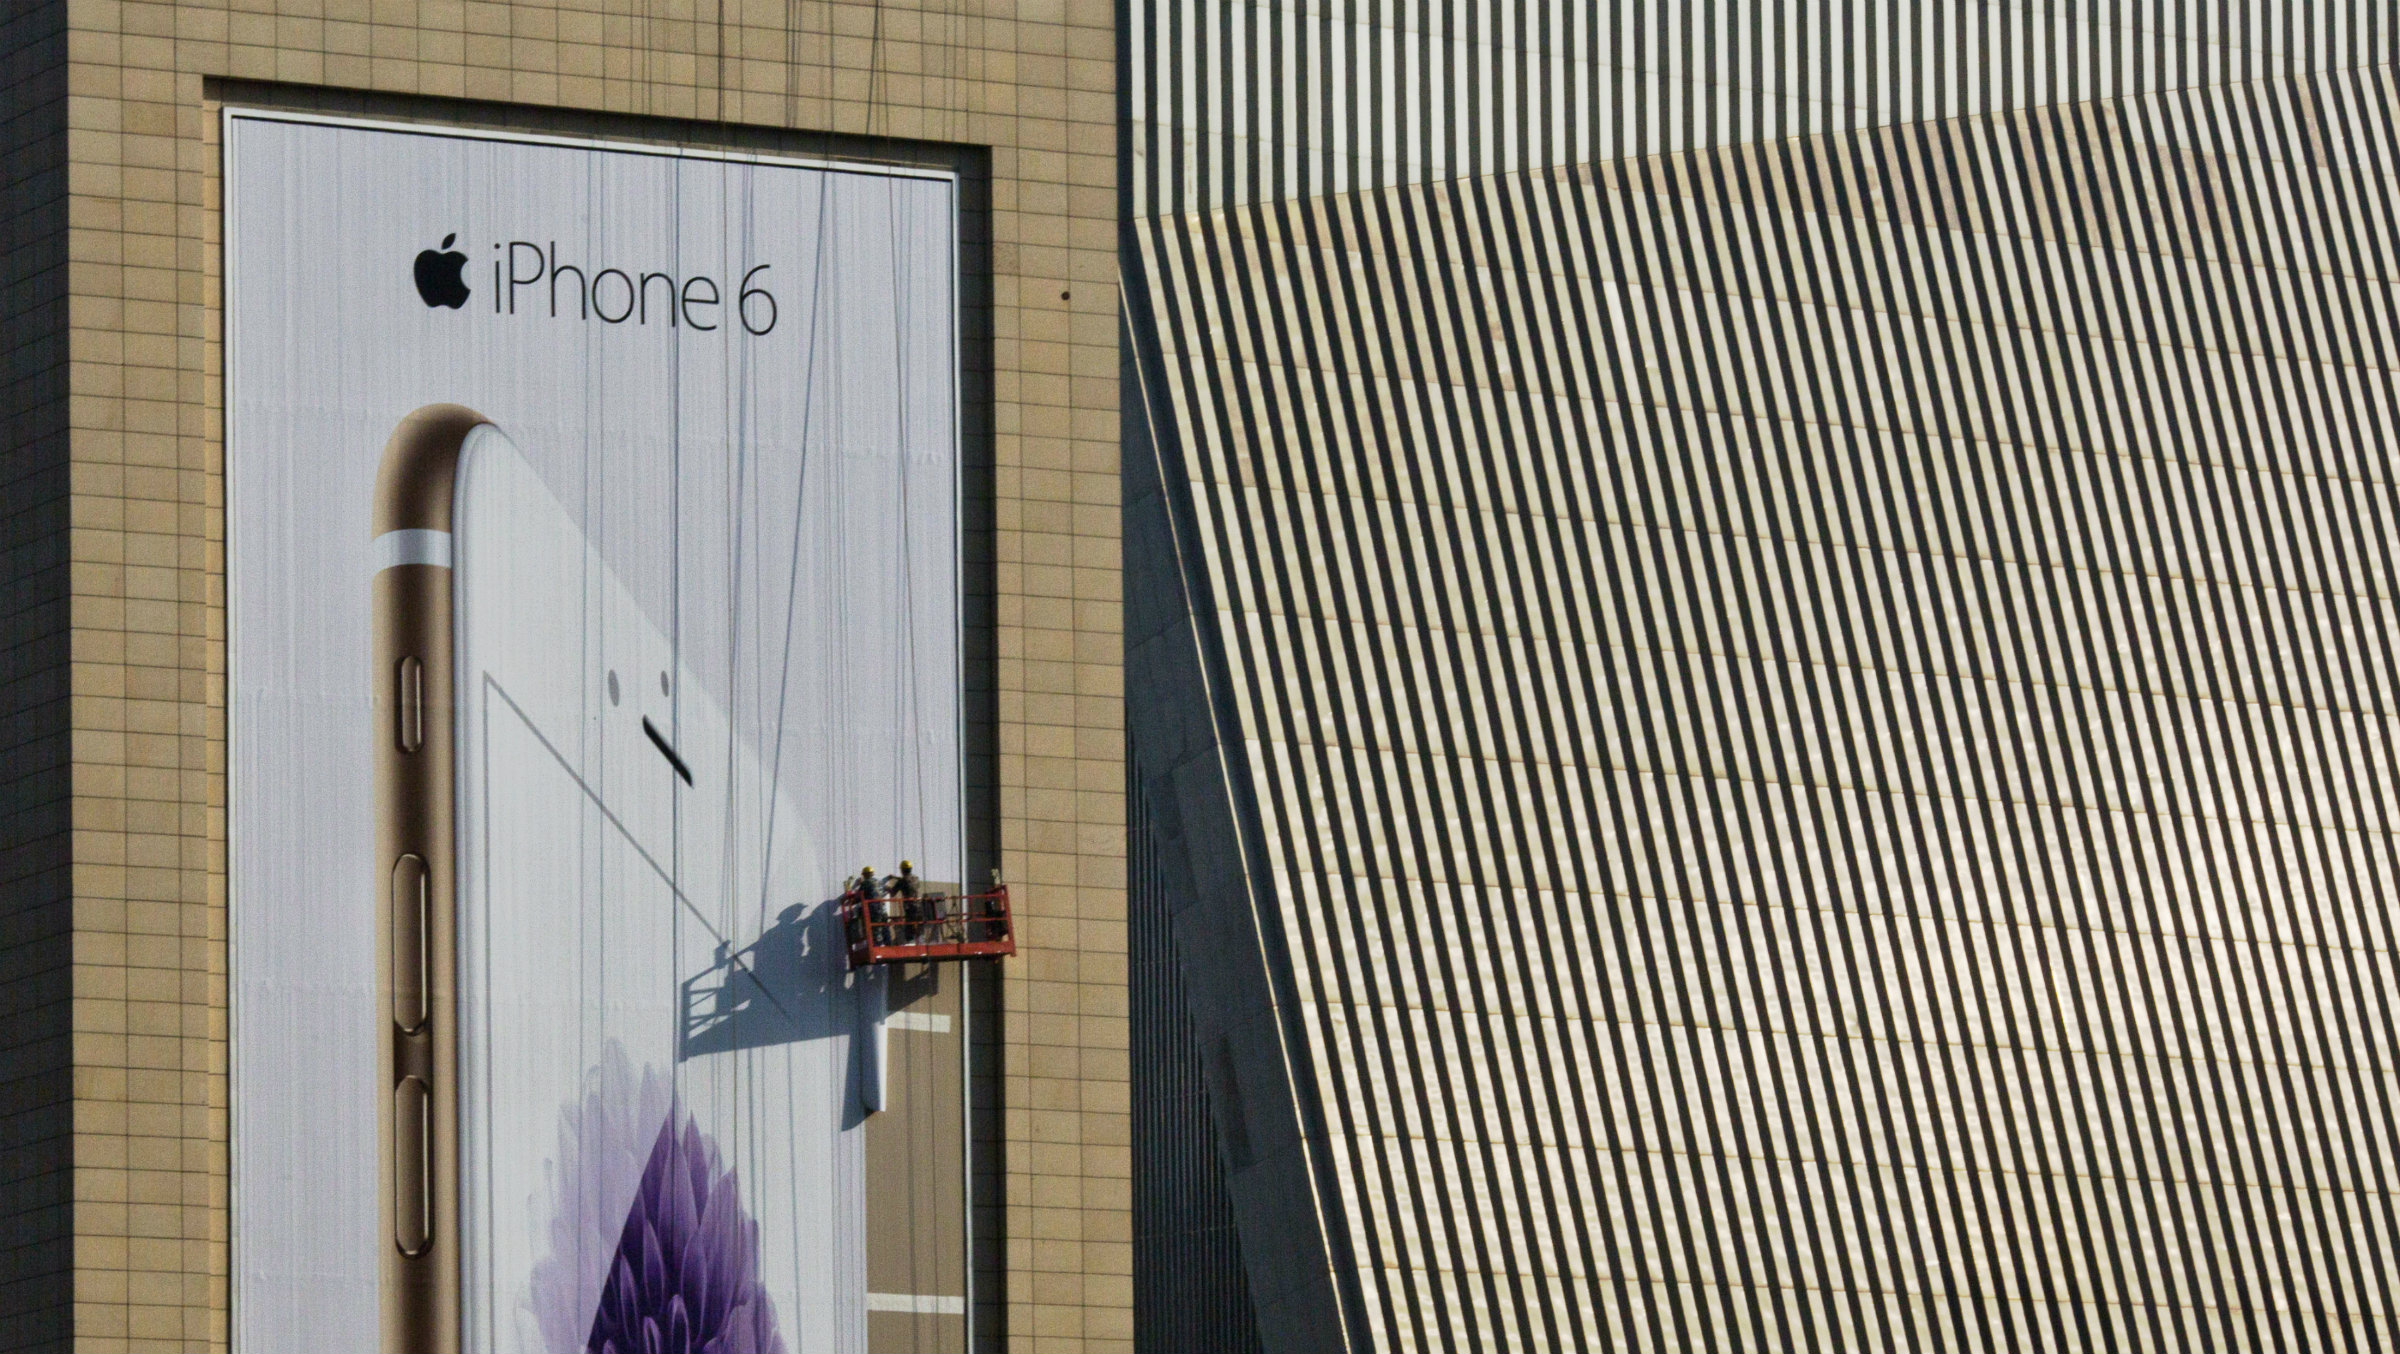 An Apple poster in Beijing.